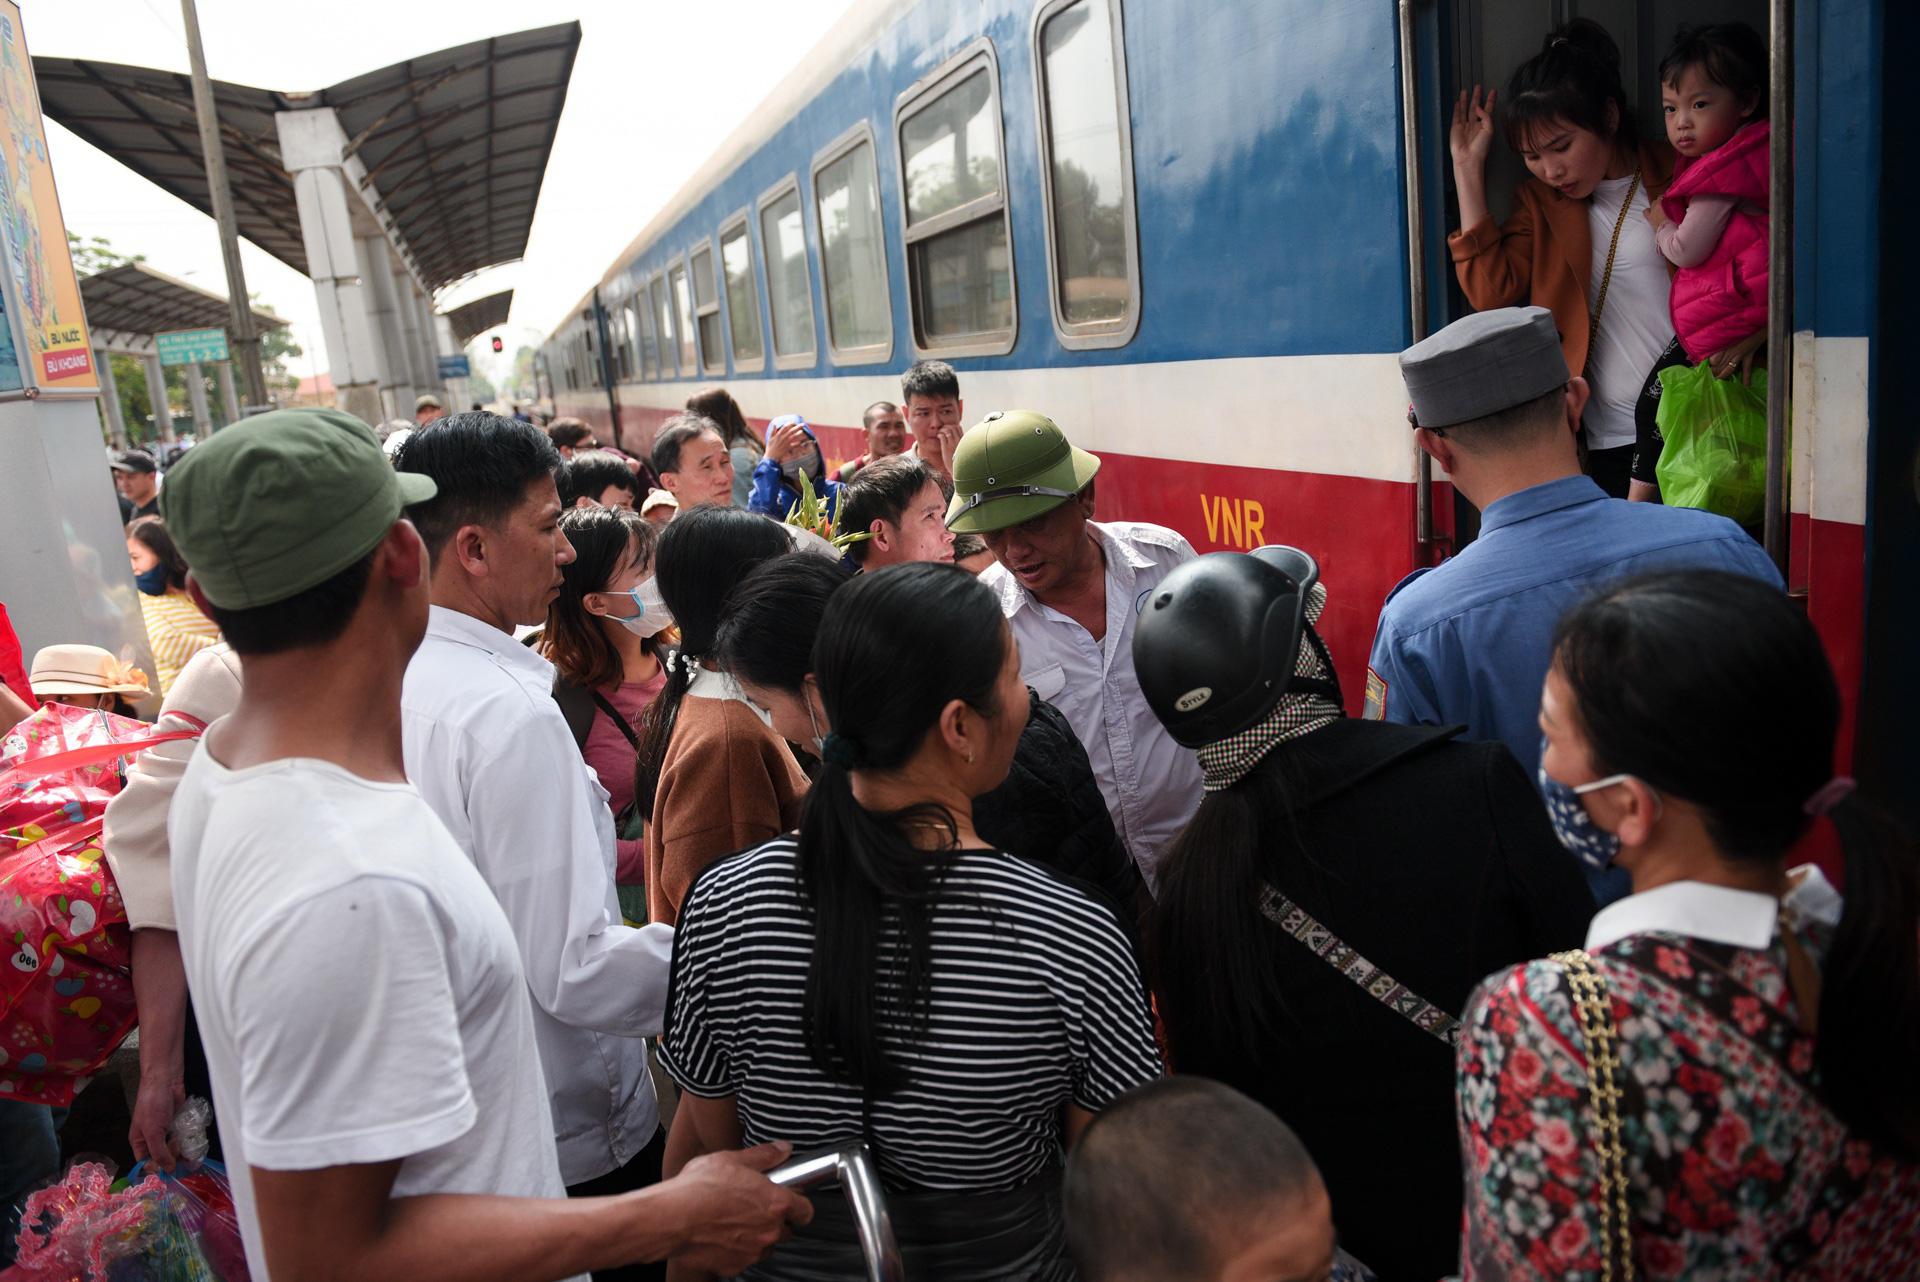 Tet tren nhung chuyen tau cuoi cung cua nam Ky Hoi hinh anh 8 DSC_3364_zing.jpg